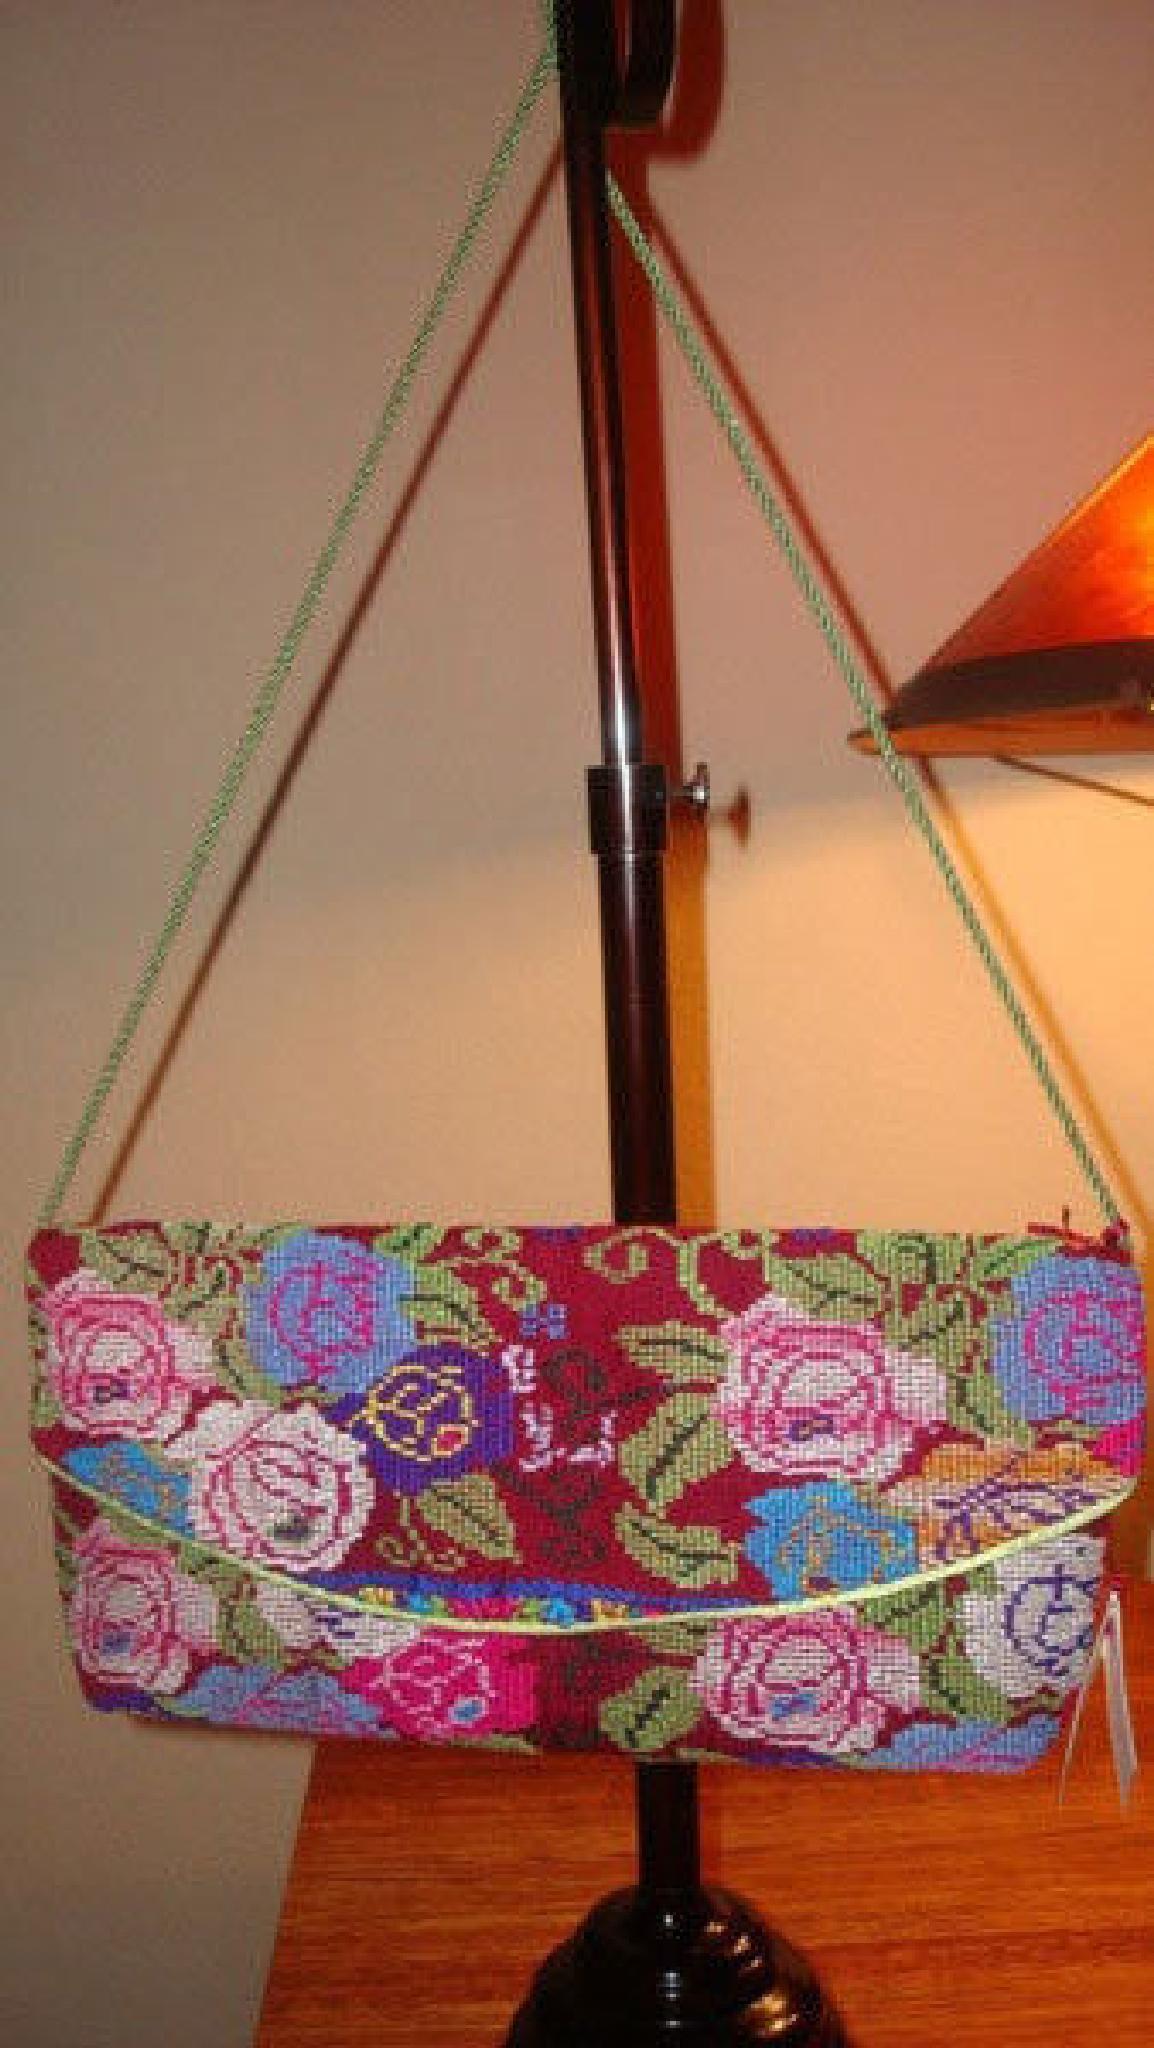 Handmade Embroidered Purse Shoulder Bag by Createnativa